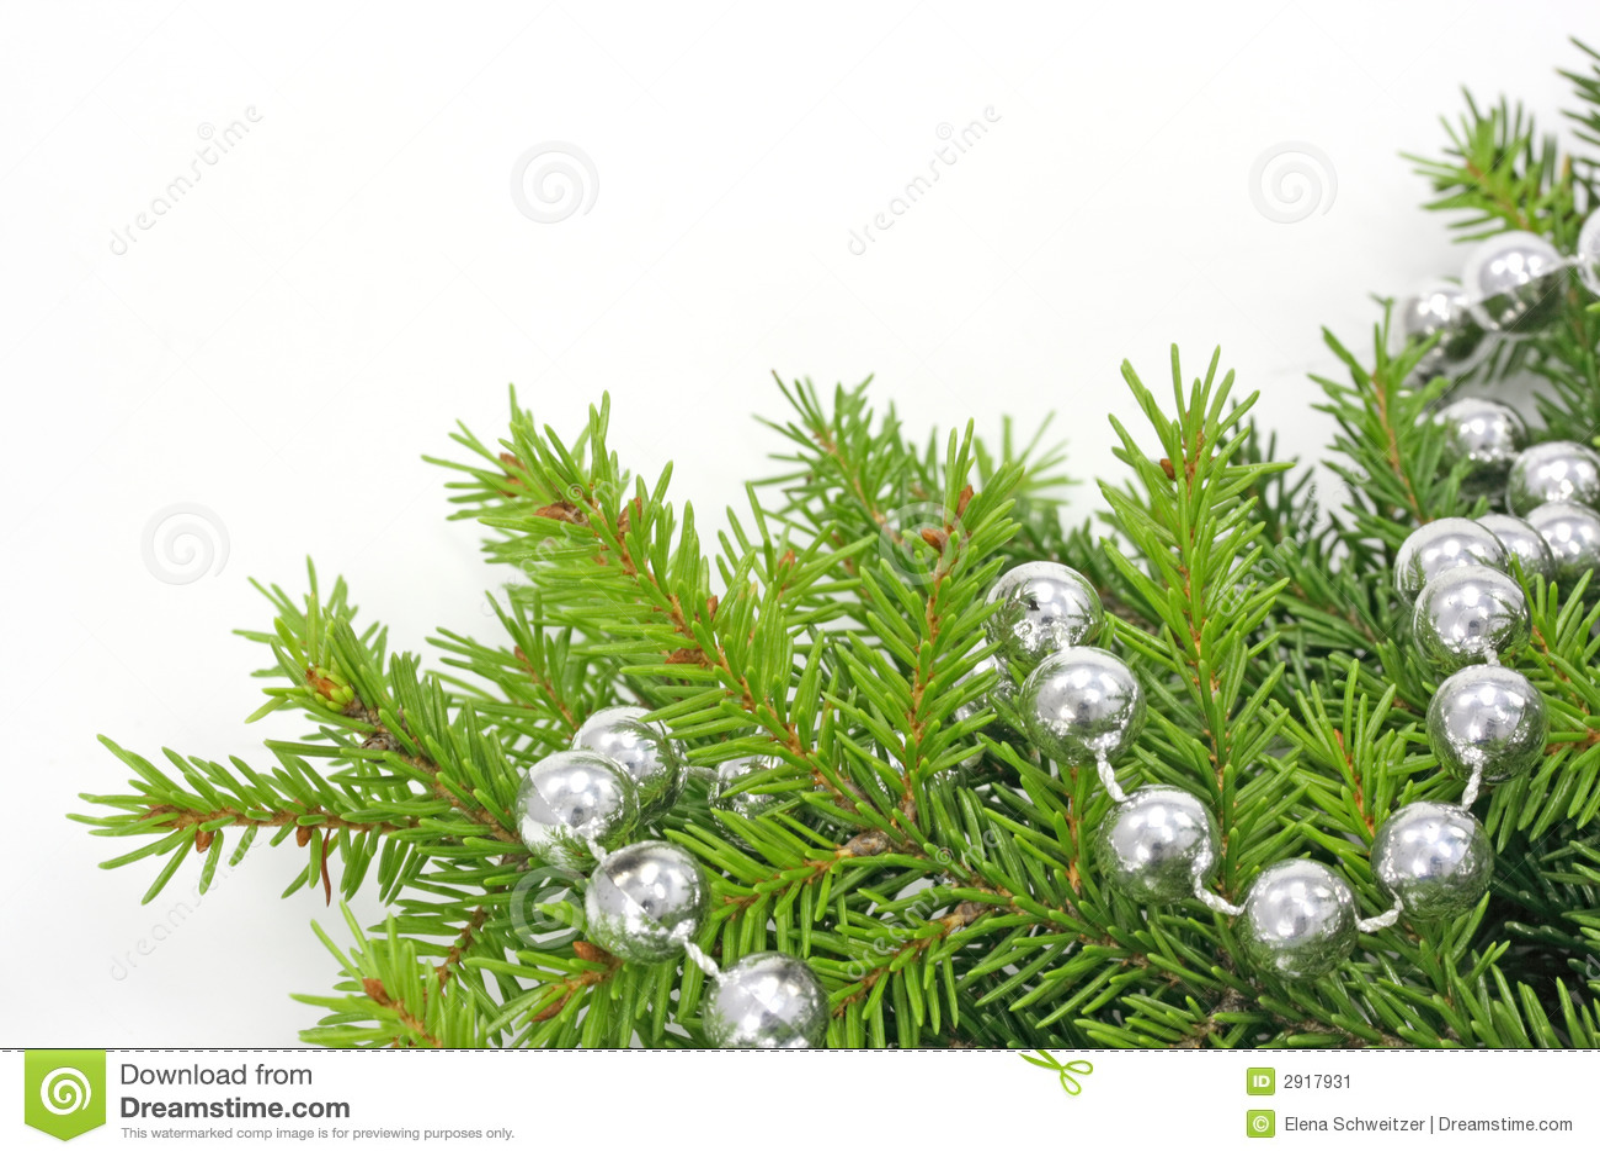 Decorated Christmas Tree Bough Stock Image - Image: 2917931